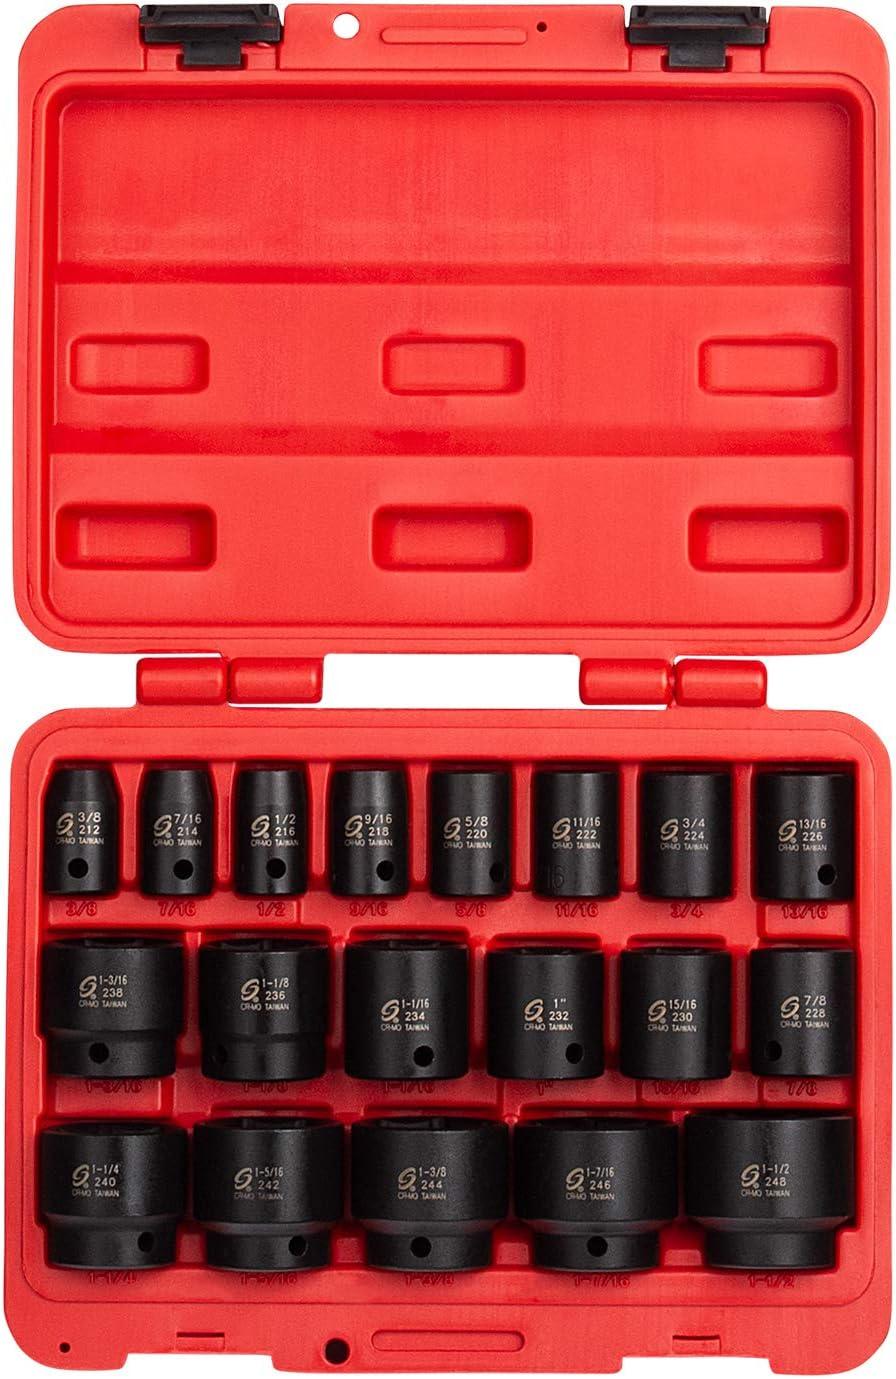 Radius Corner Design Meets ANSI Standards 1//2 Inch Drive Impact Socket Set SAE 19-Piece 1-1//2 Inch Dual Size Markings Cr-Mo Alloy Steel Sunex 2640 Heavy Duty Storage Case 3//8 Inch